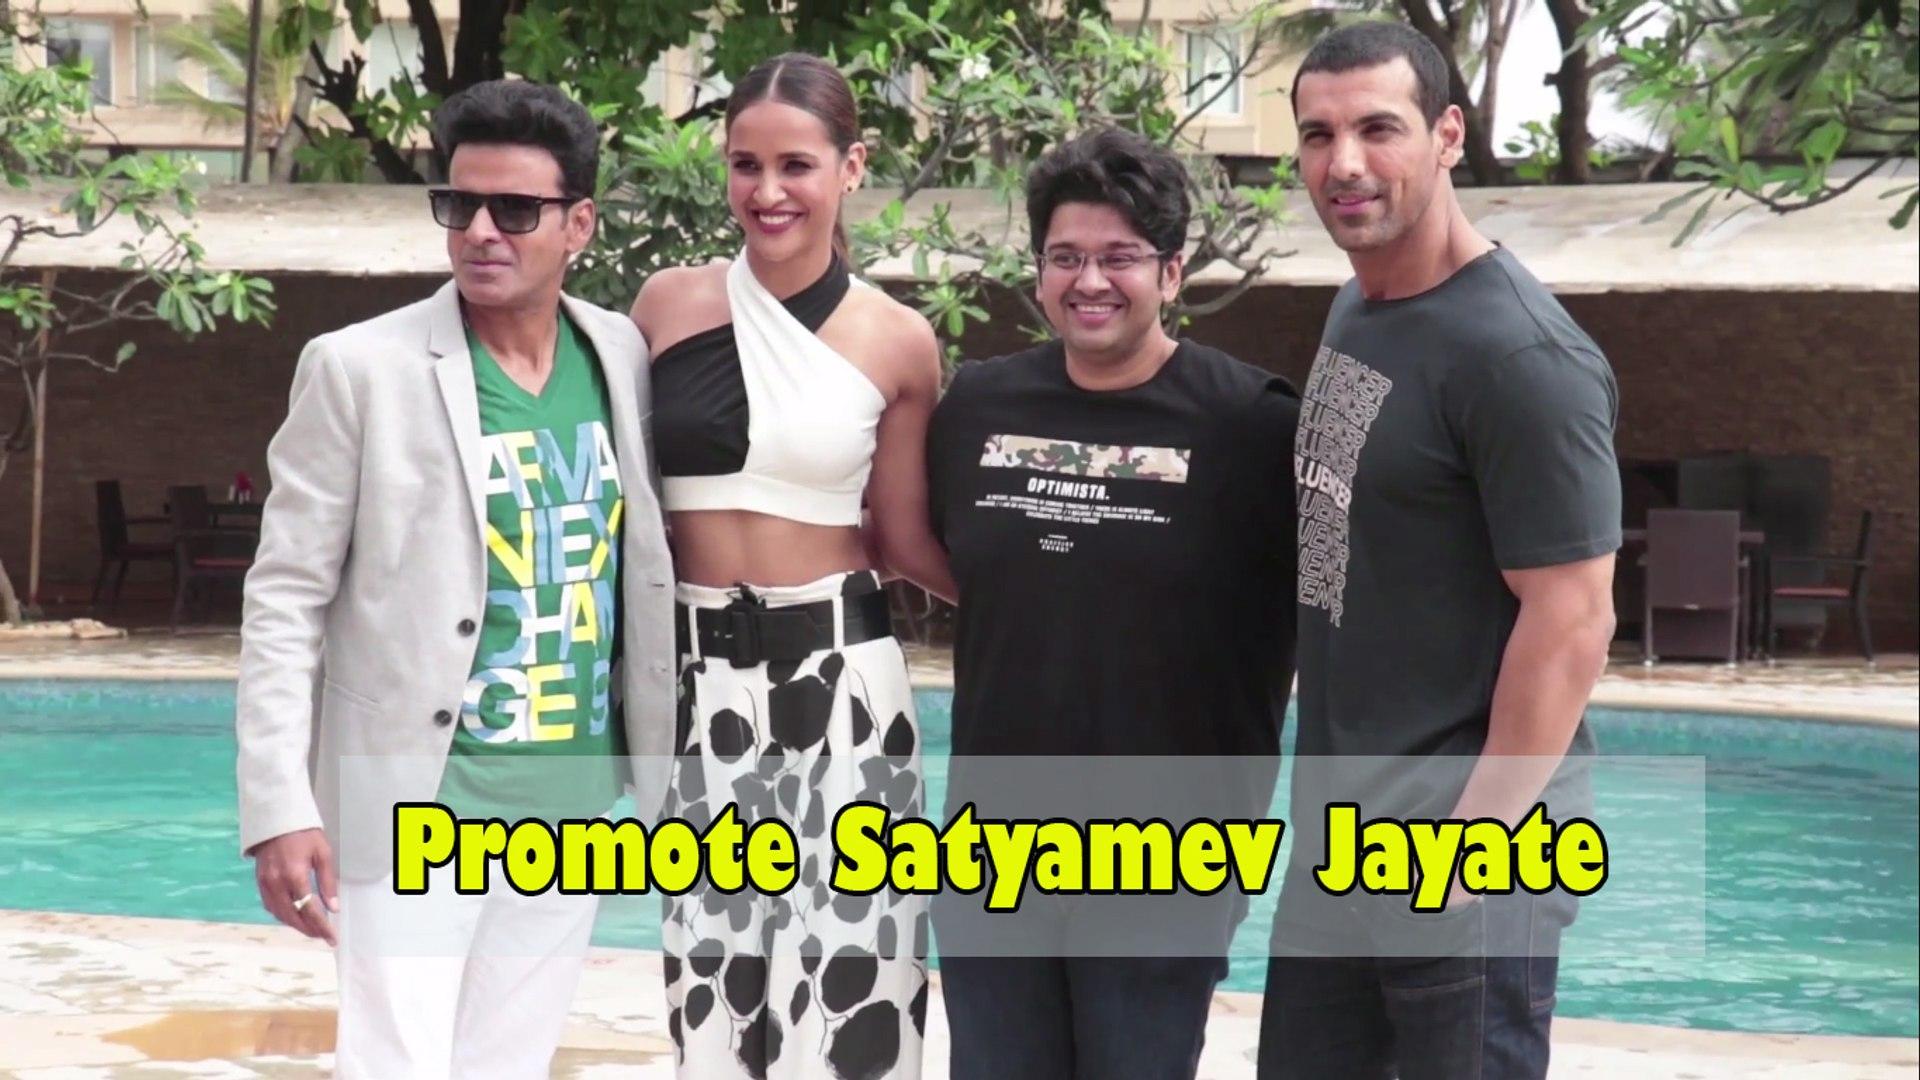 John Abraham, Manoj Bajpai, Nora Fatehi Promote Satyamev Jayate